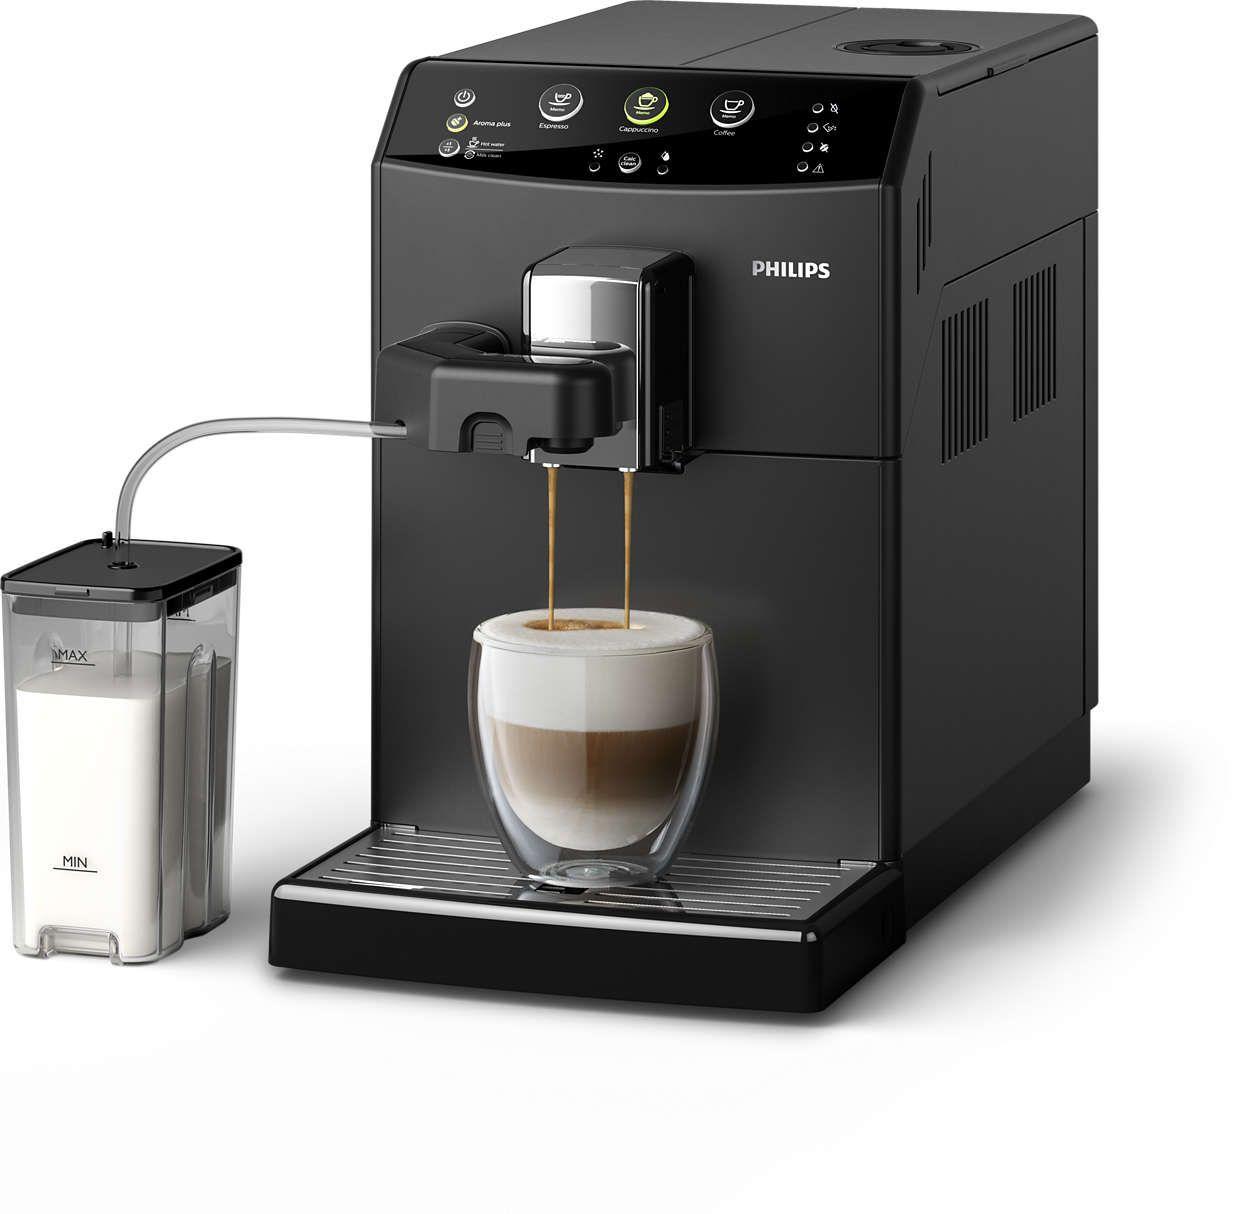 Reaco-Cafetera Superautomática